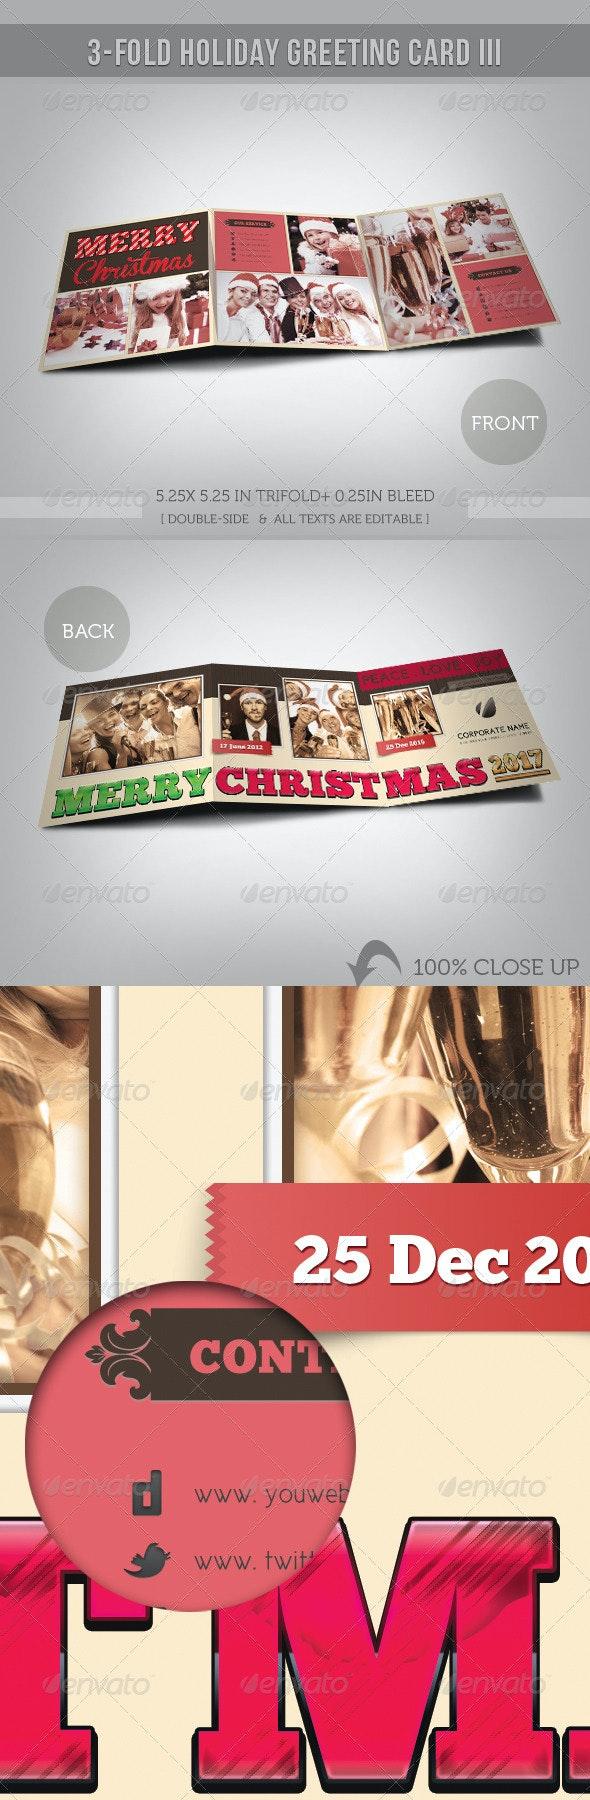 3-Fold Holiday Greeting Card III - Bold Wish - Holiday Greeting Cards